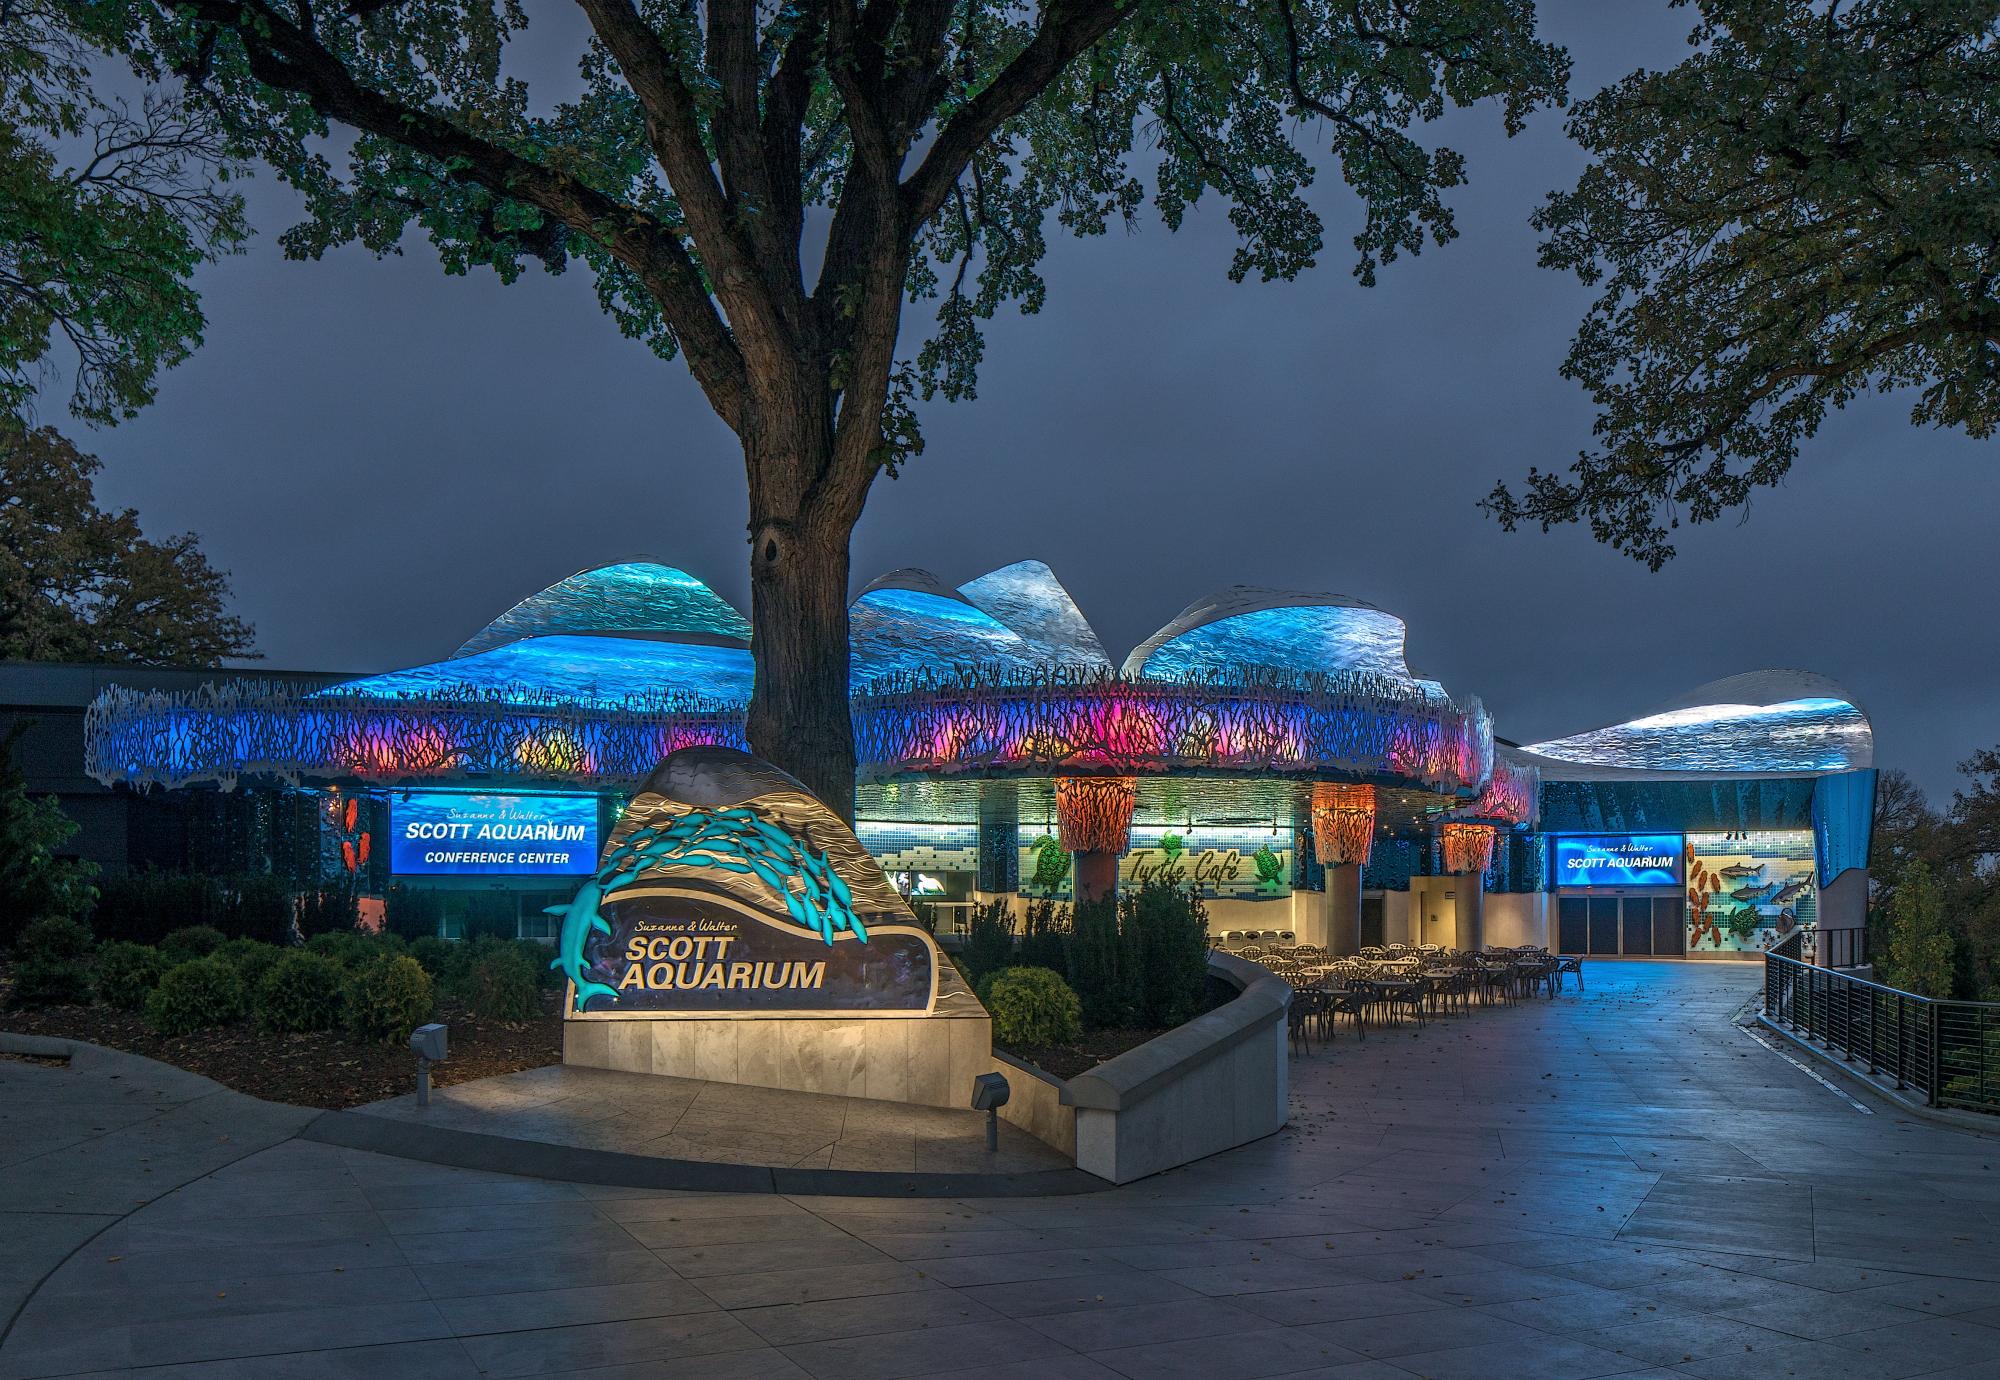 Omaha's Henry Doorly Zoo and Aquarium - Aquarium Facade Renovation